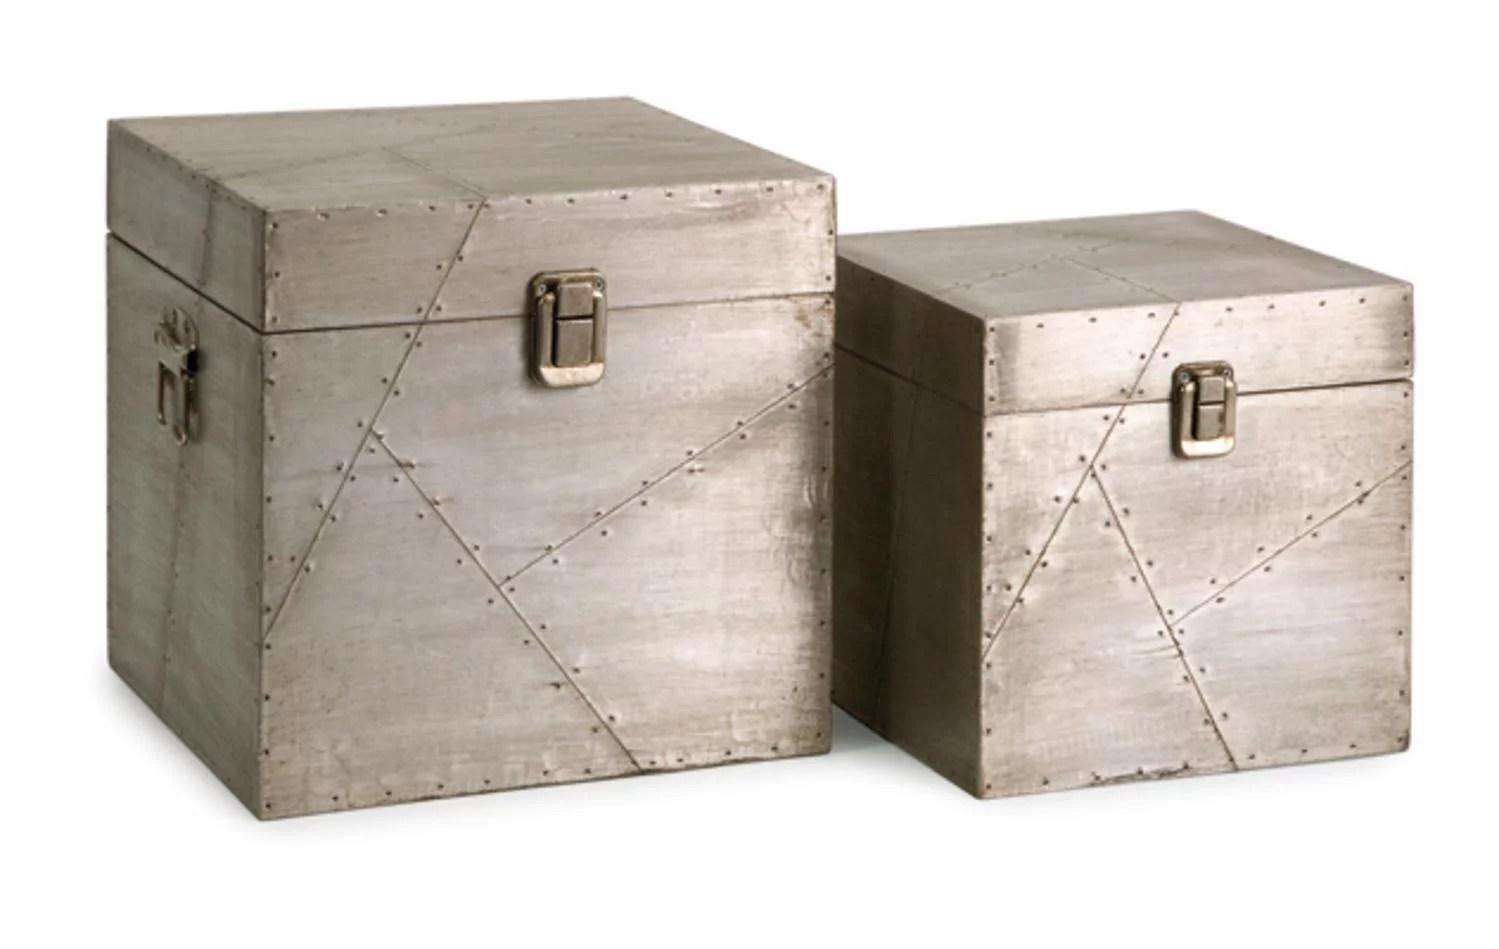 Set Of 2 Sleek Industrial Style Aluminum Storage Trunk Boxes 10 Walmart Com Walmart Com